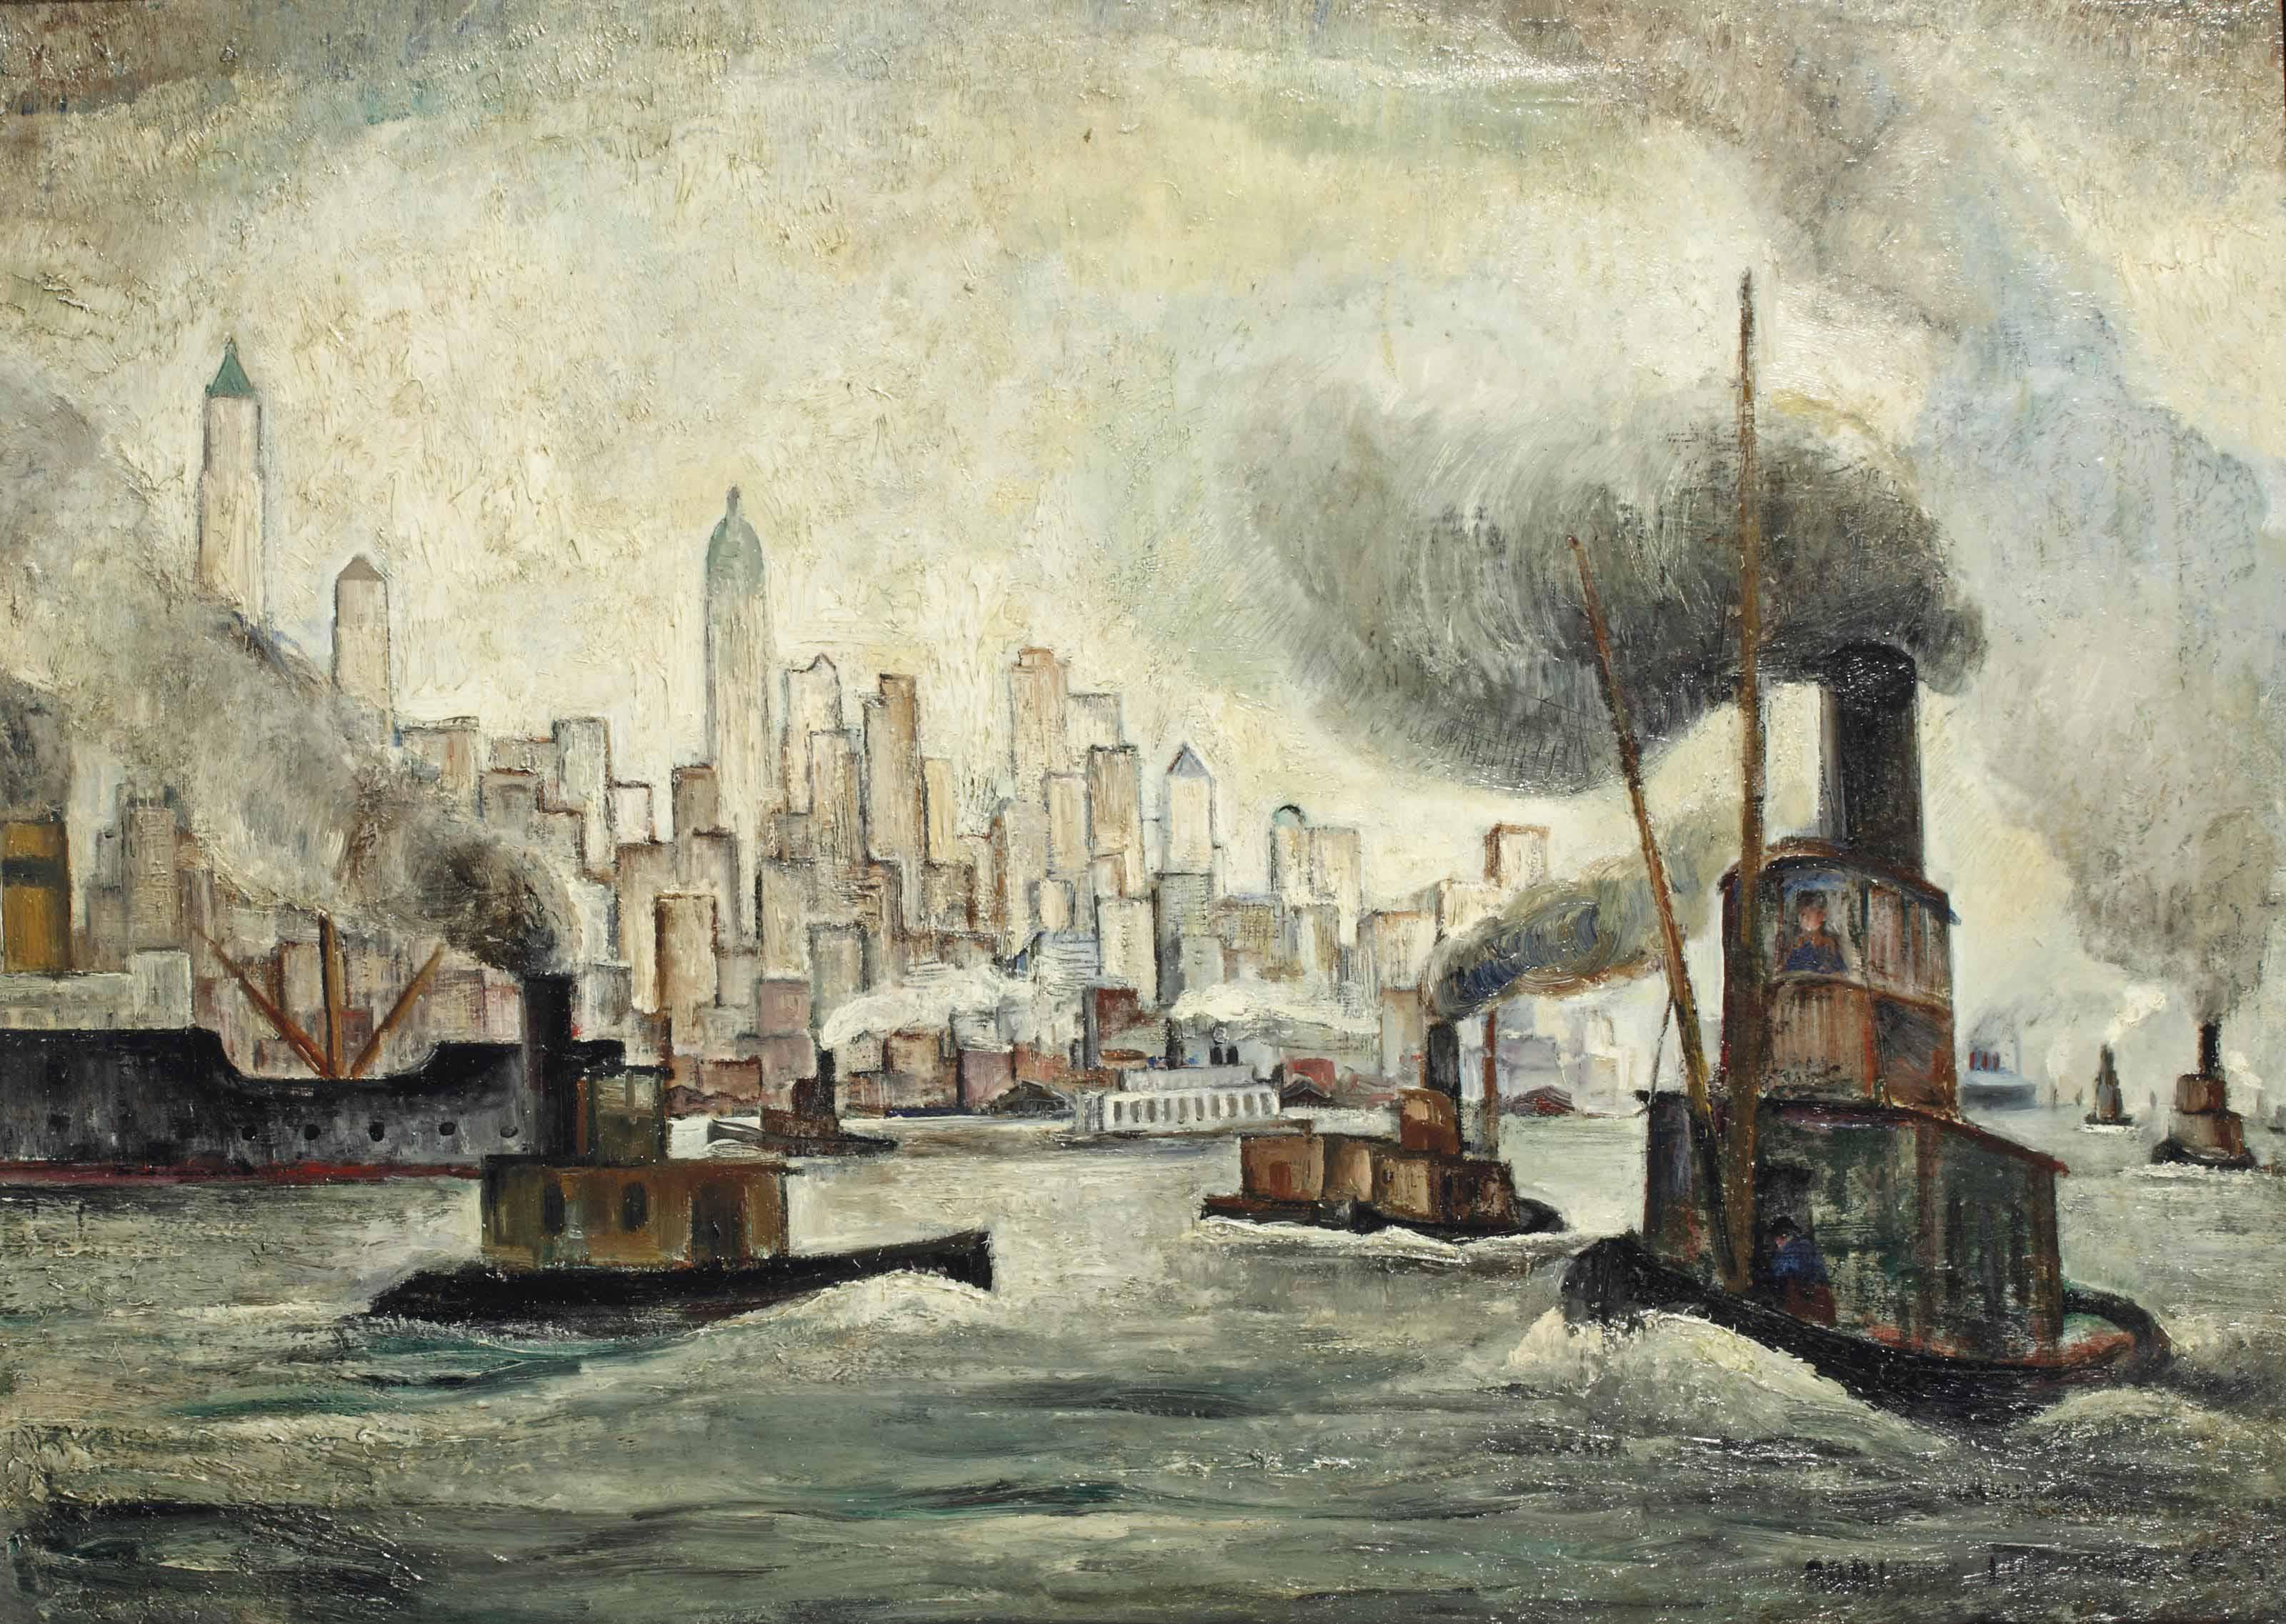 Steam vessels on the Hudson, New York beyond